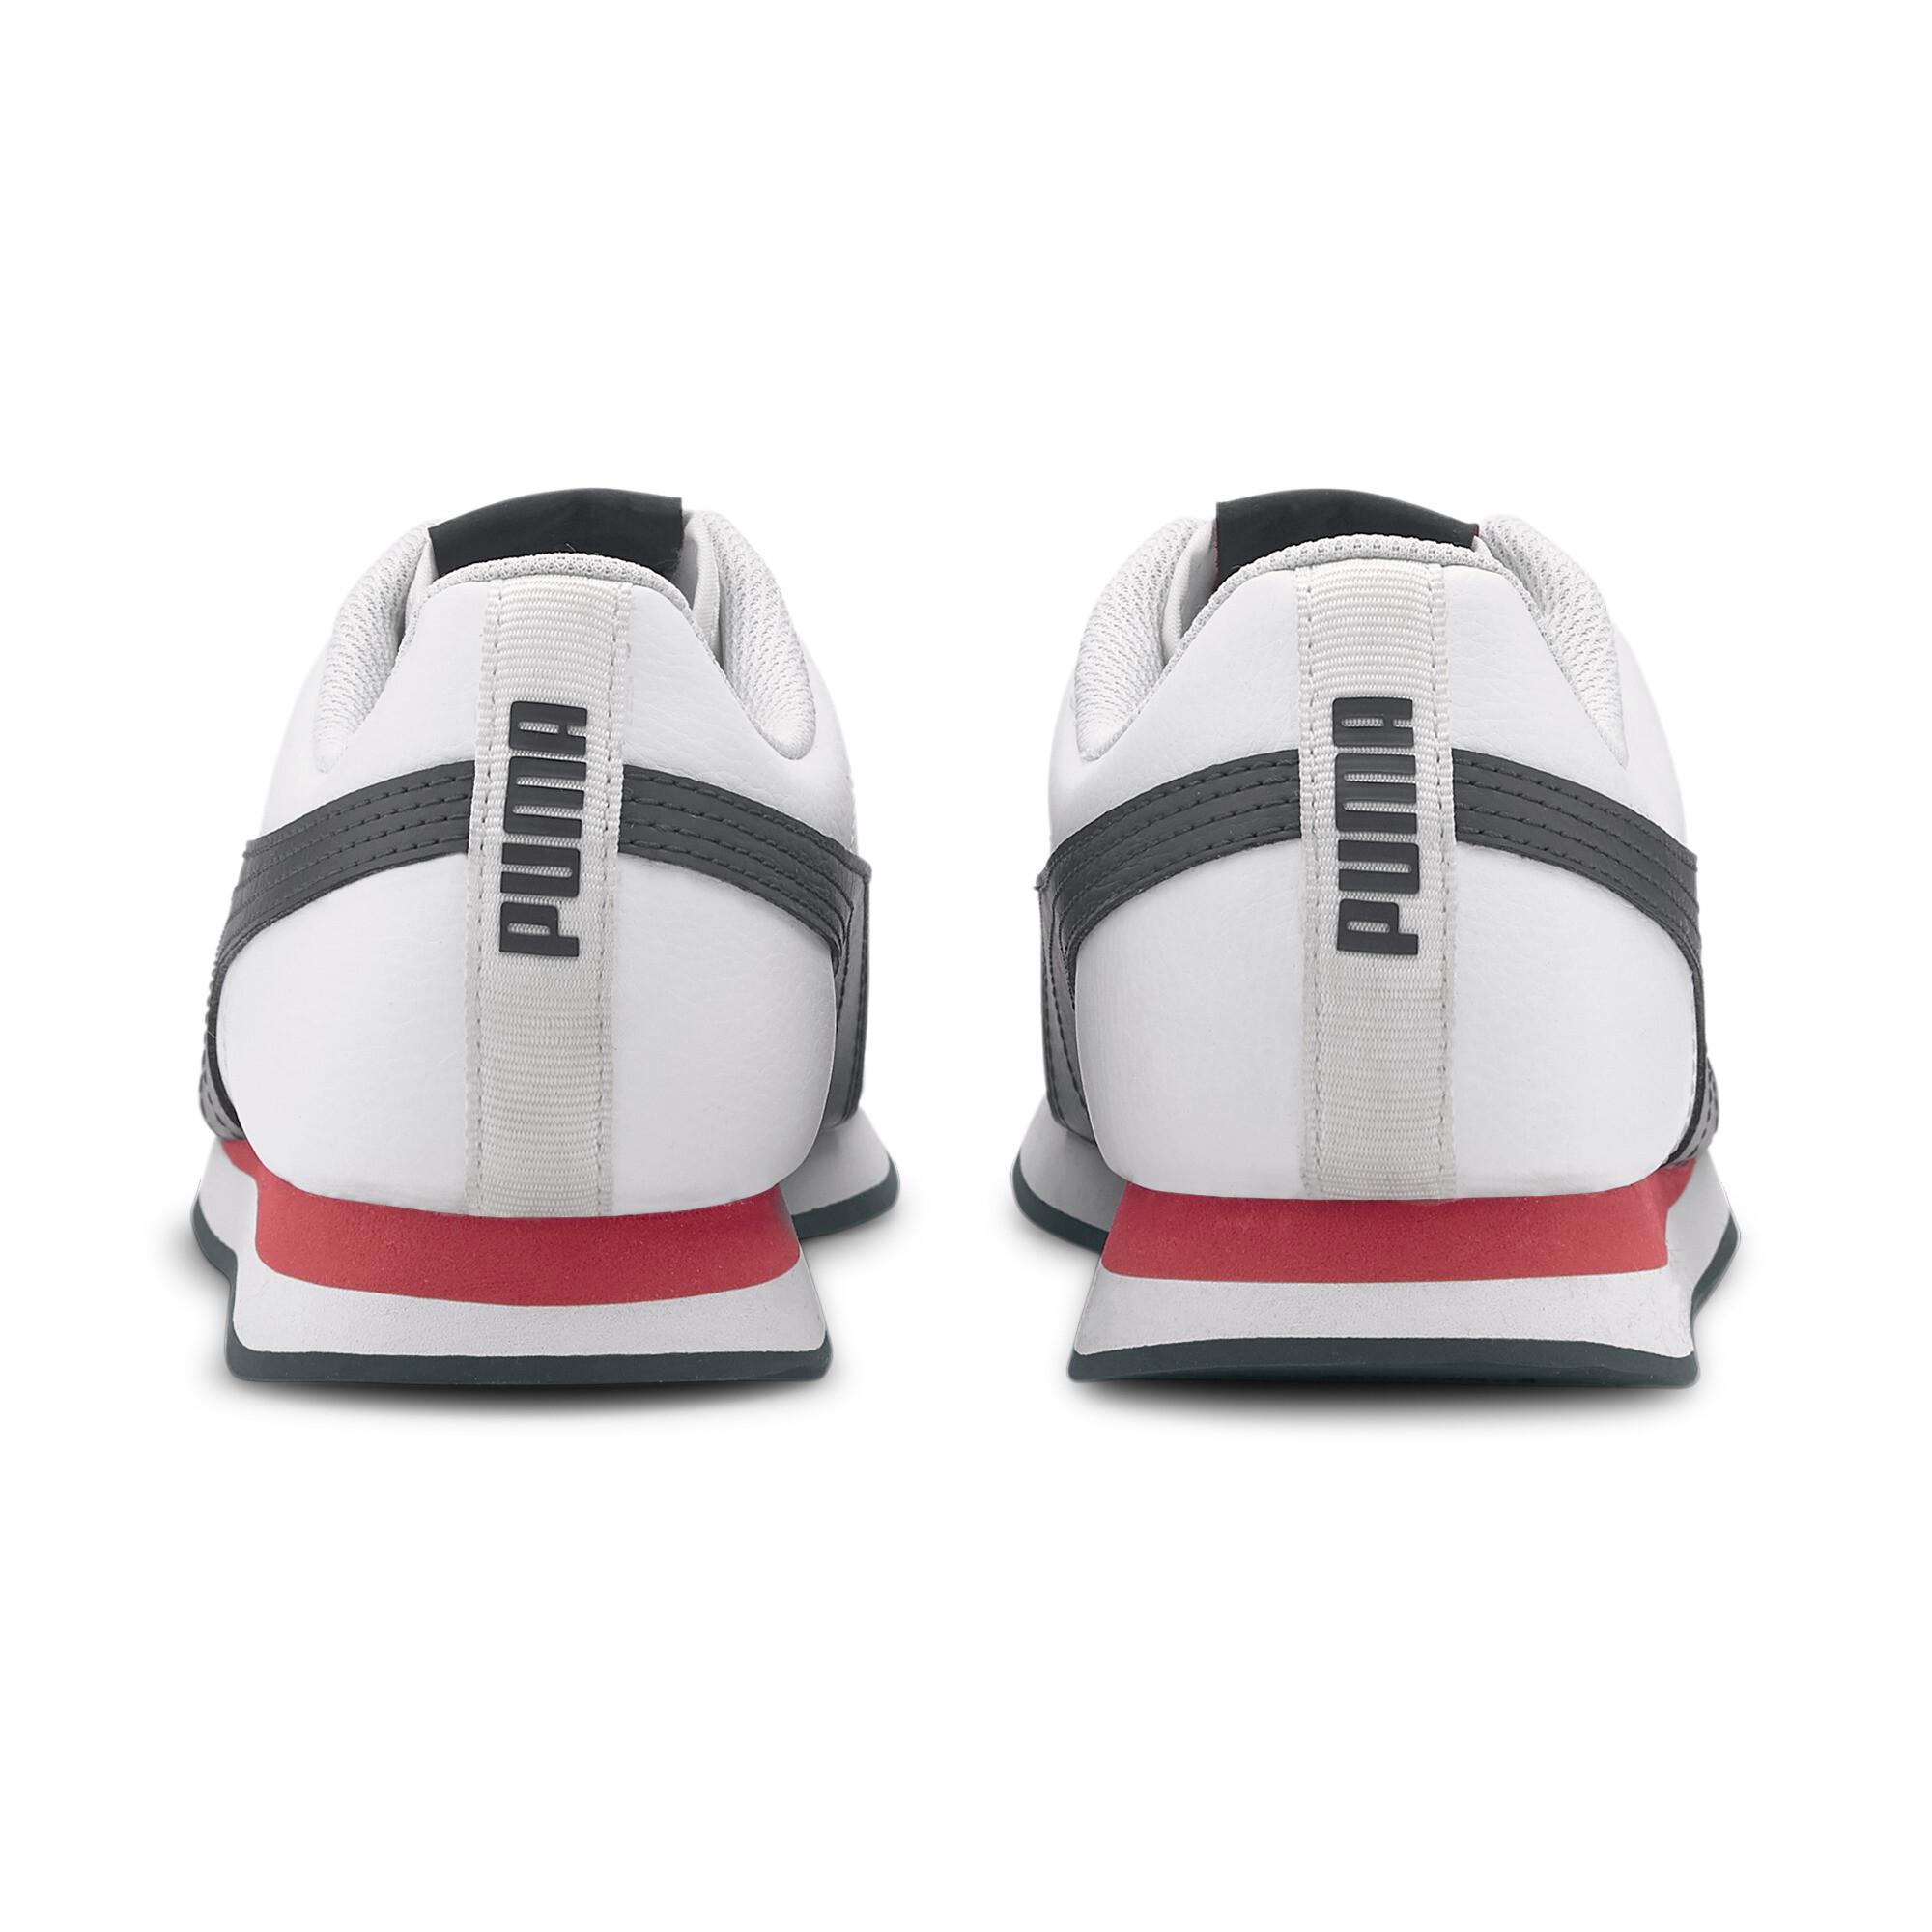 PUMA-Men-039-s-Turin-II-Sneakers thumbnail 34